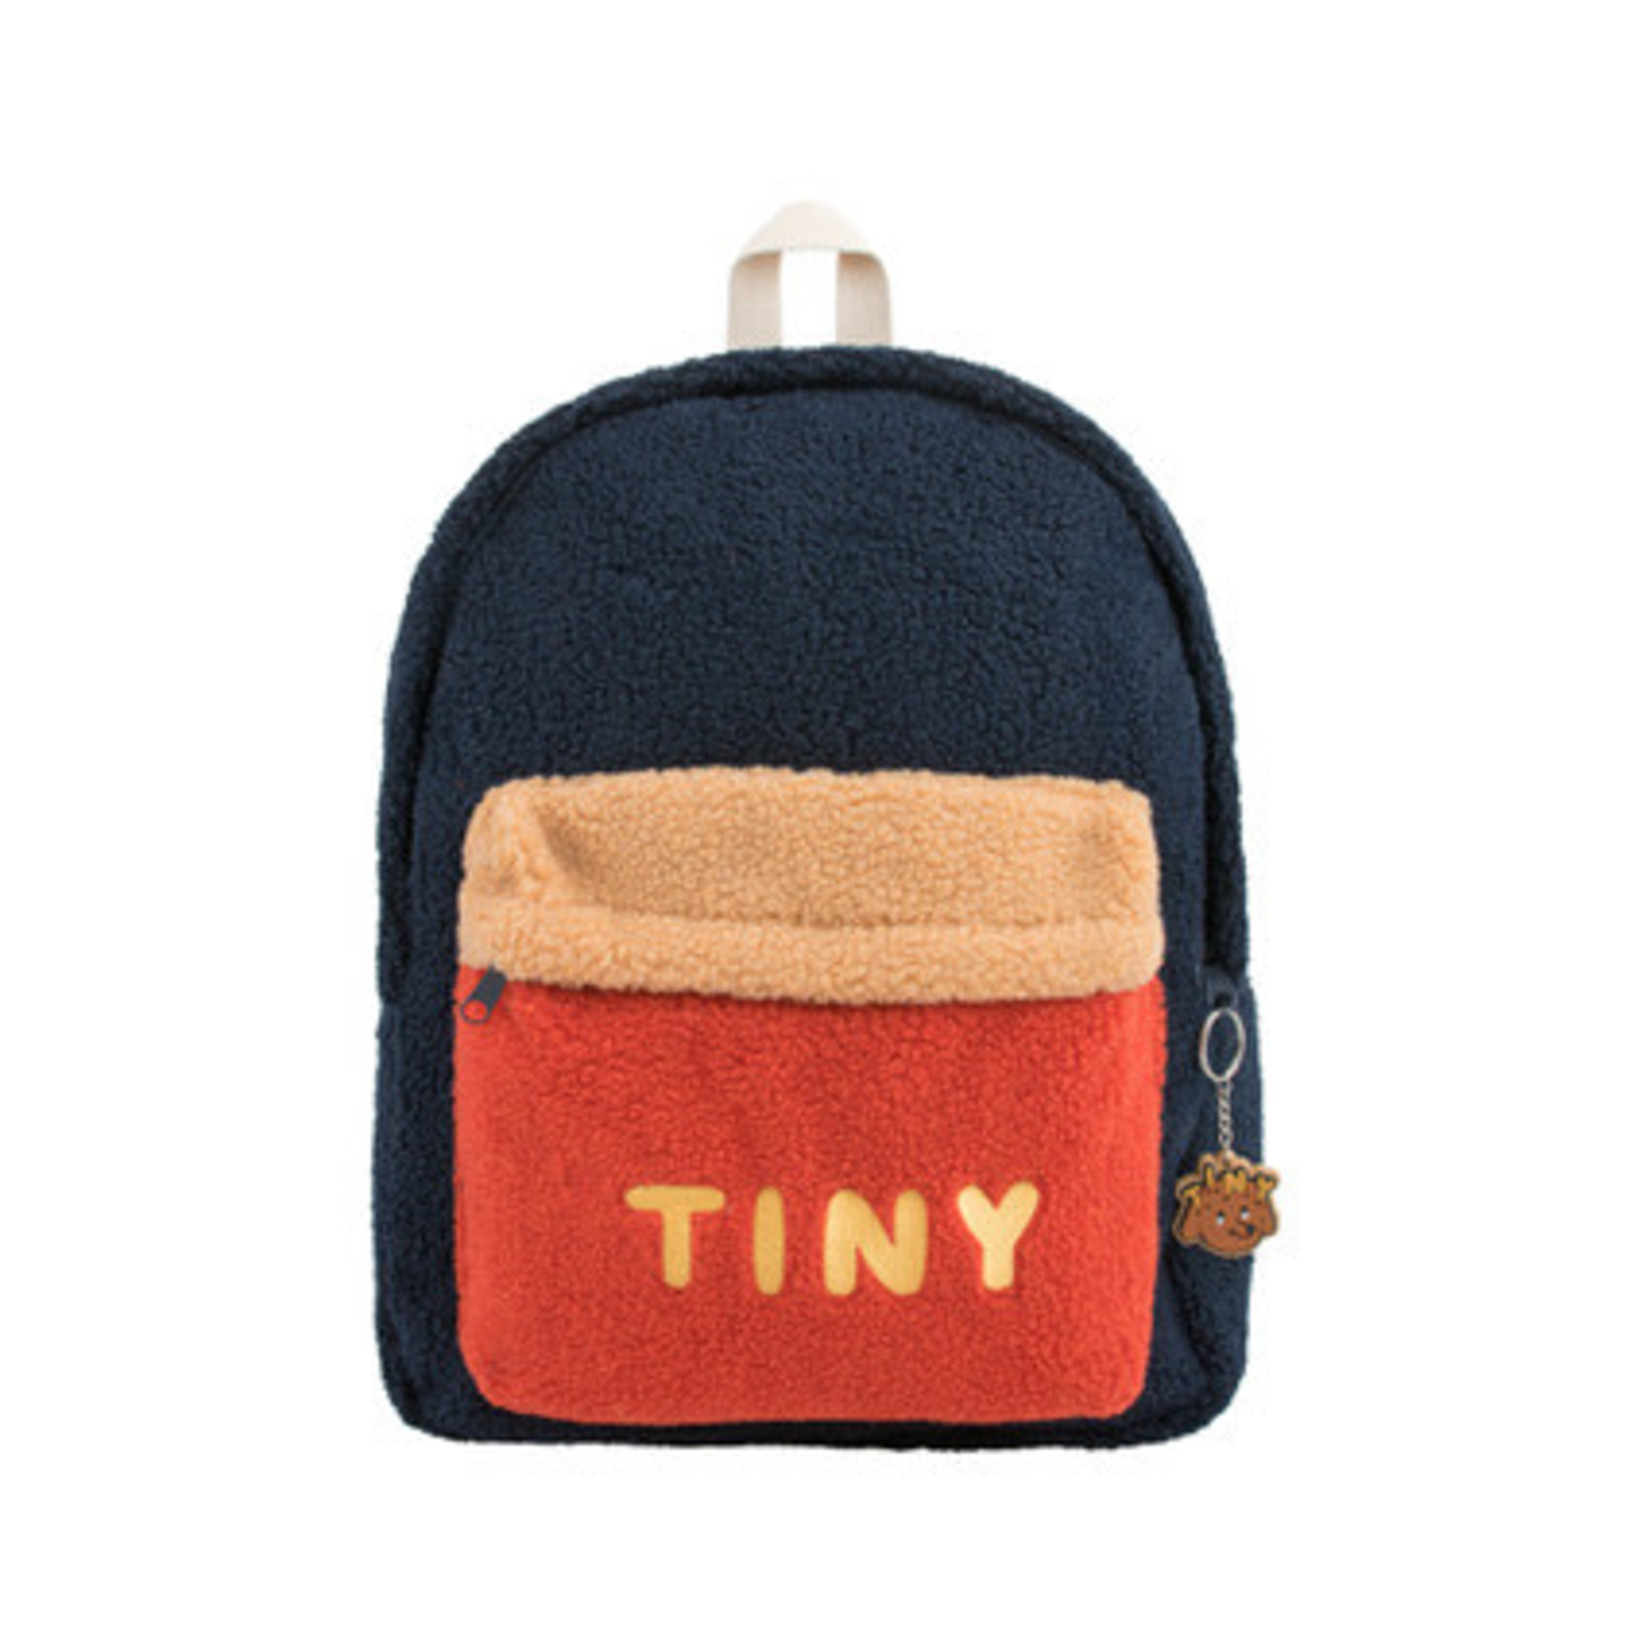 TINY COTTONS TINY COTTONS SALE big Colorado black backpack